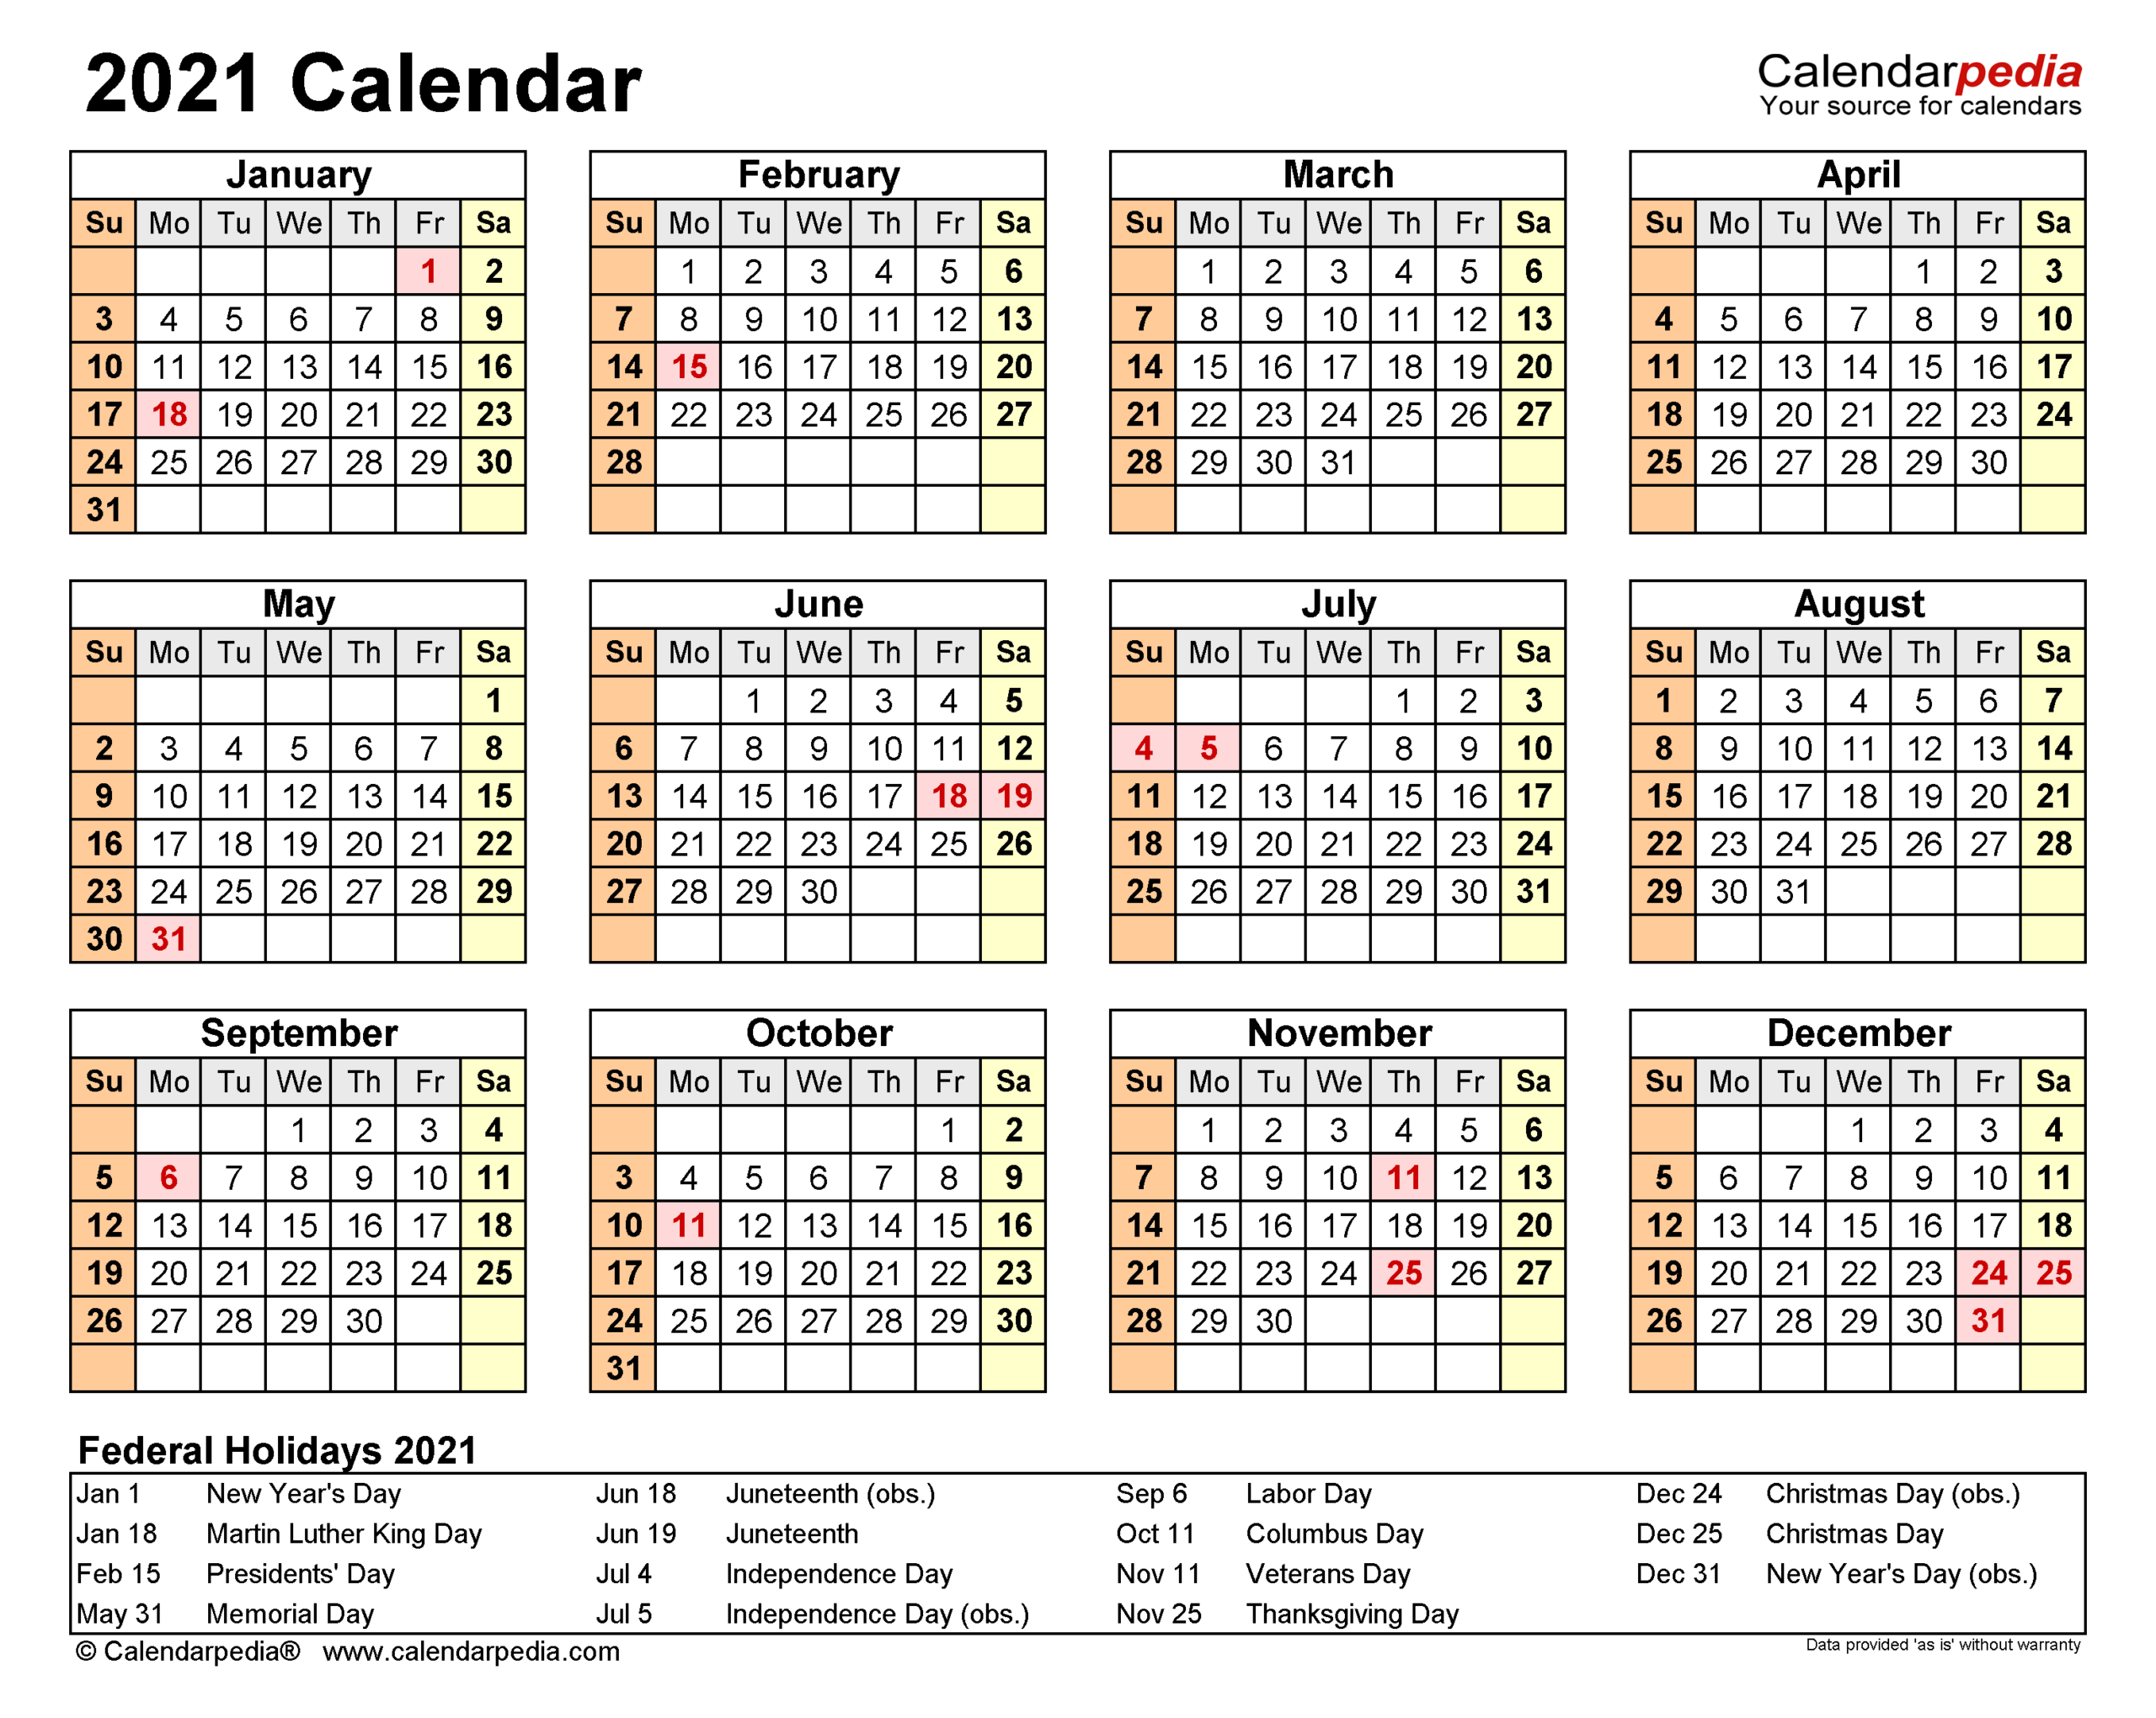 2021 Calendar - Free Printable Word Templates - Calendarpedia-Microsoft Word Calendar Template 2021